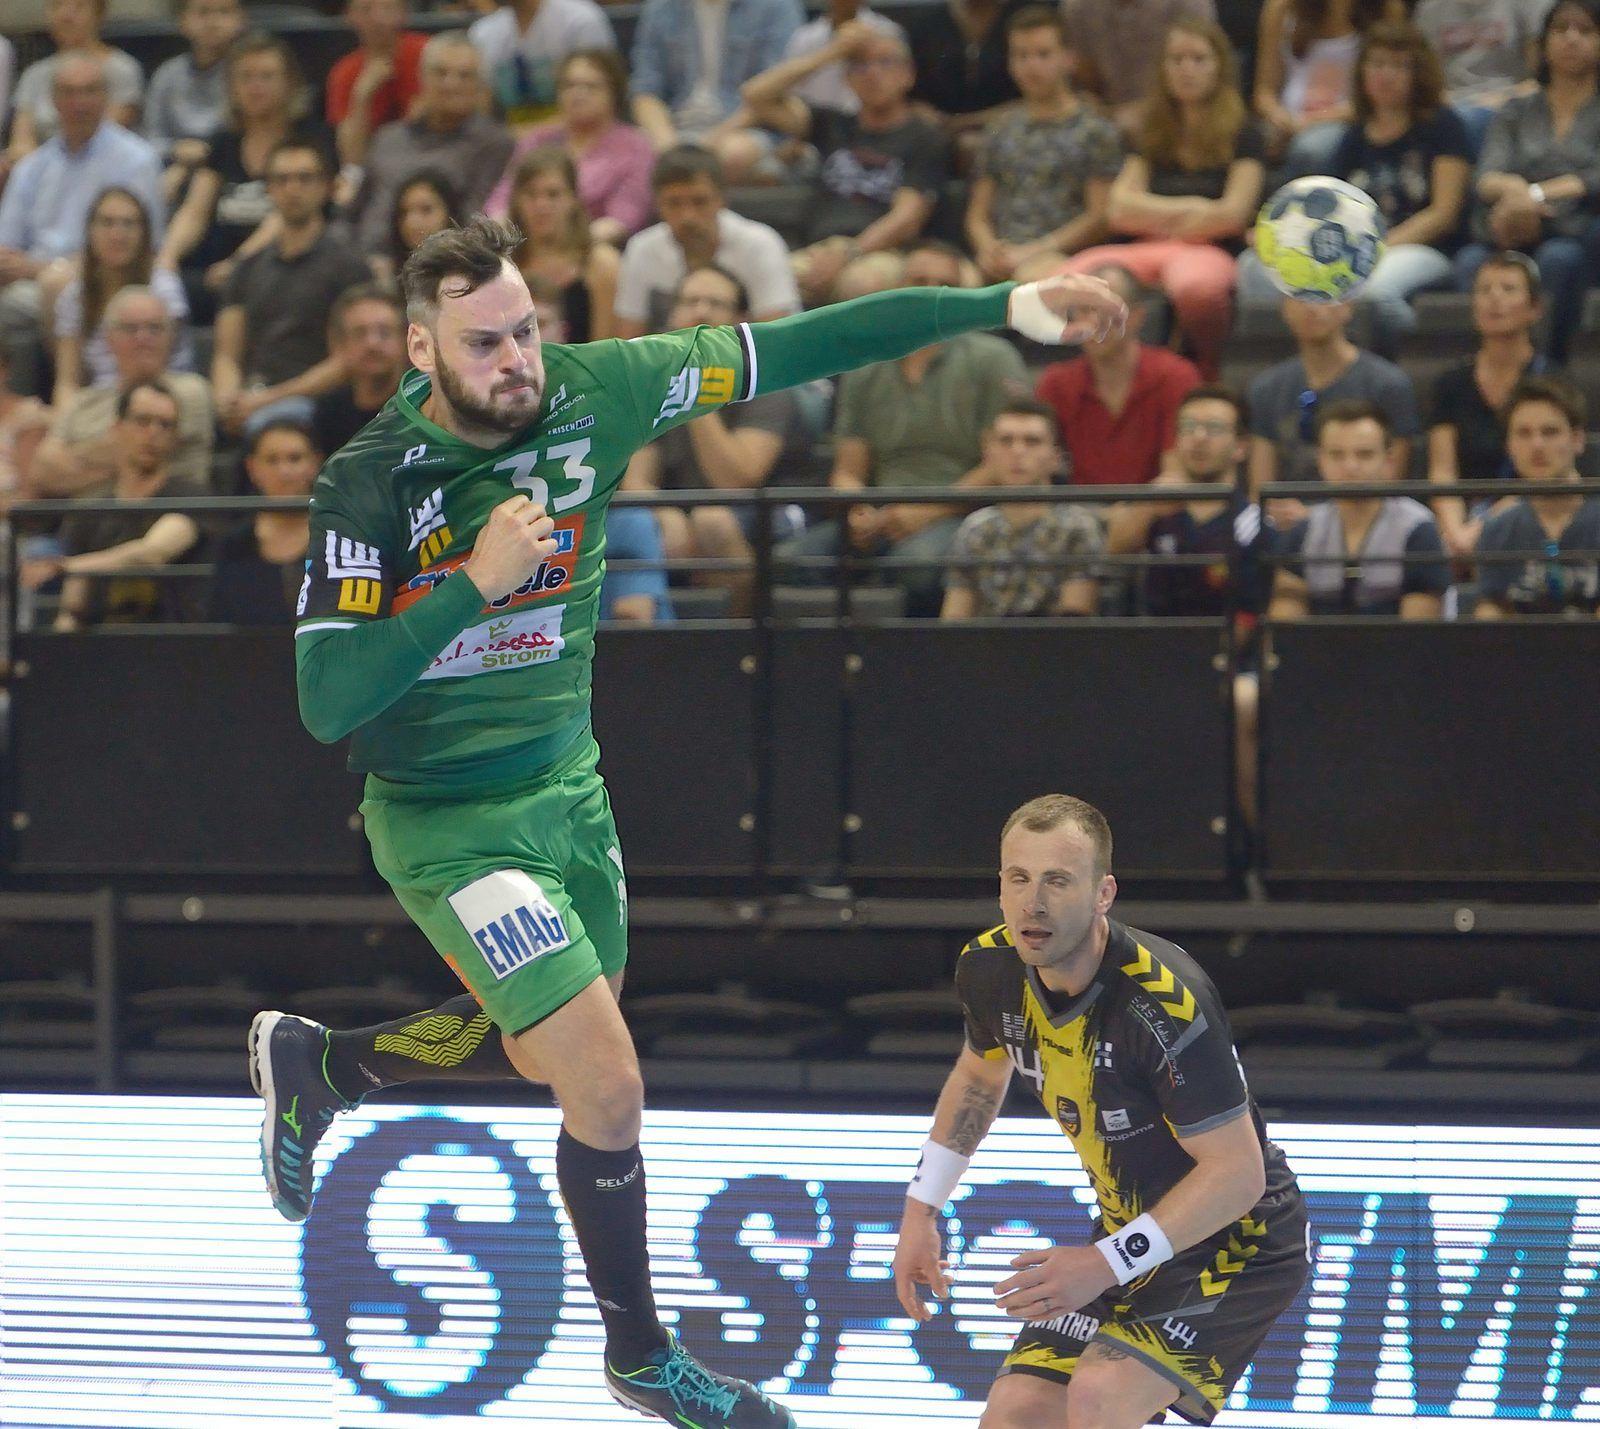 EHF AVANTAGE GÖPPINGEN CHAMBÉRY / GÖPPINGEN : 27-30 Les photos du match